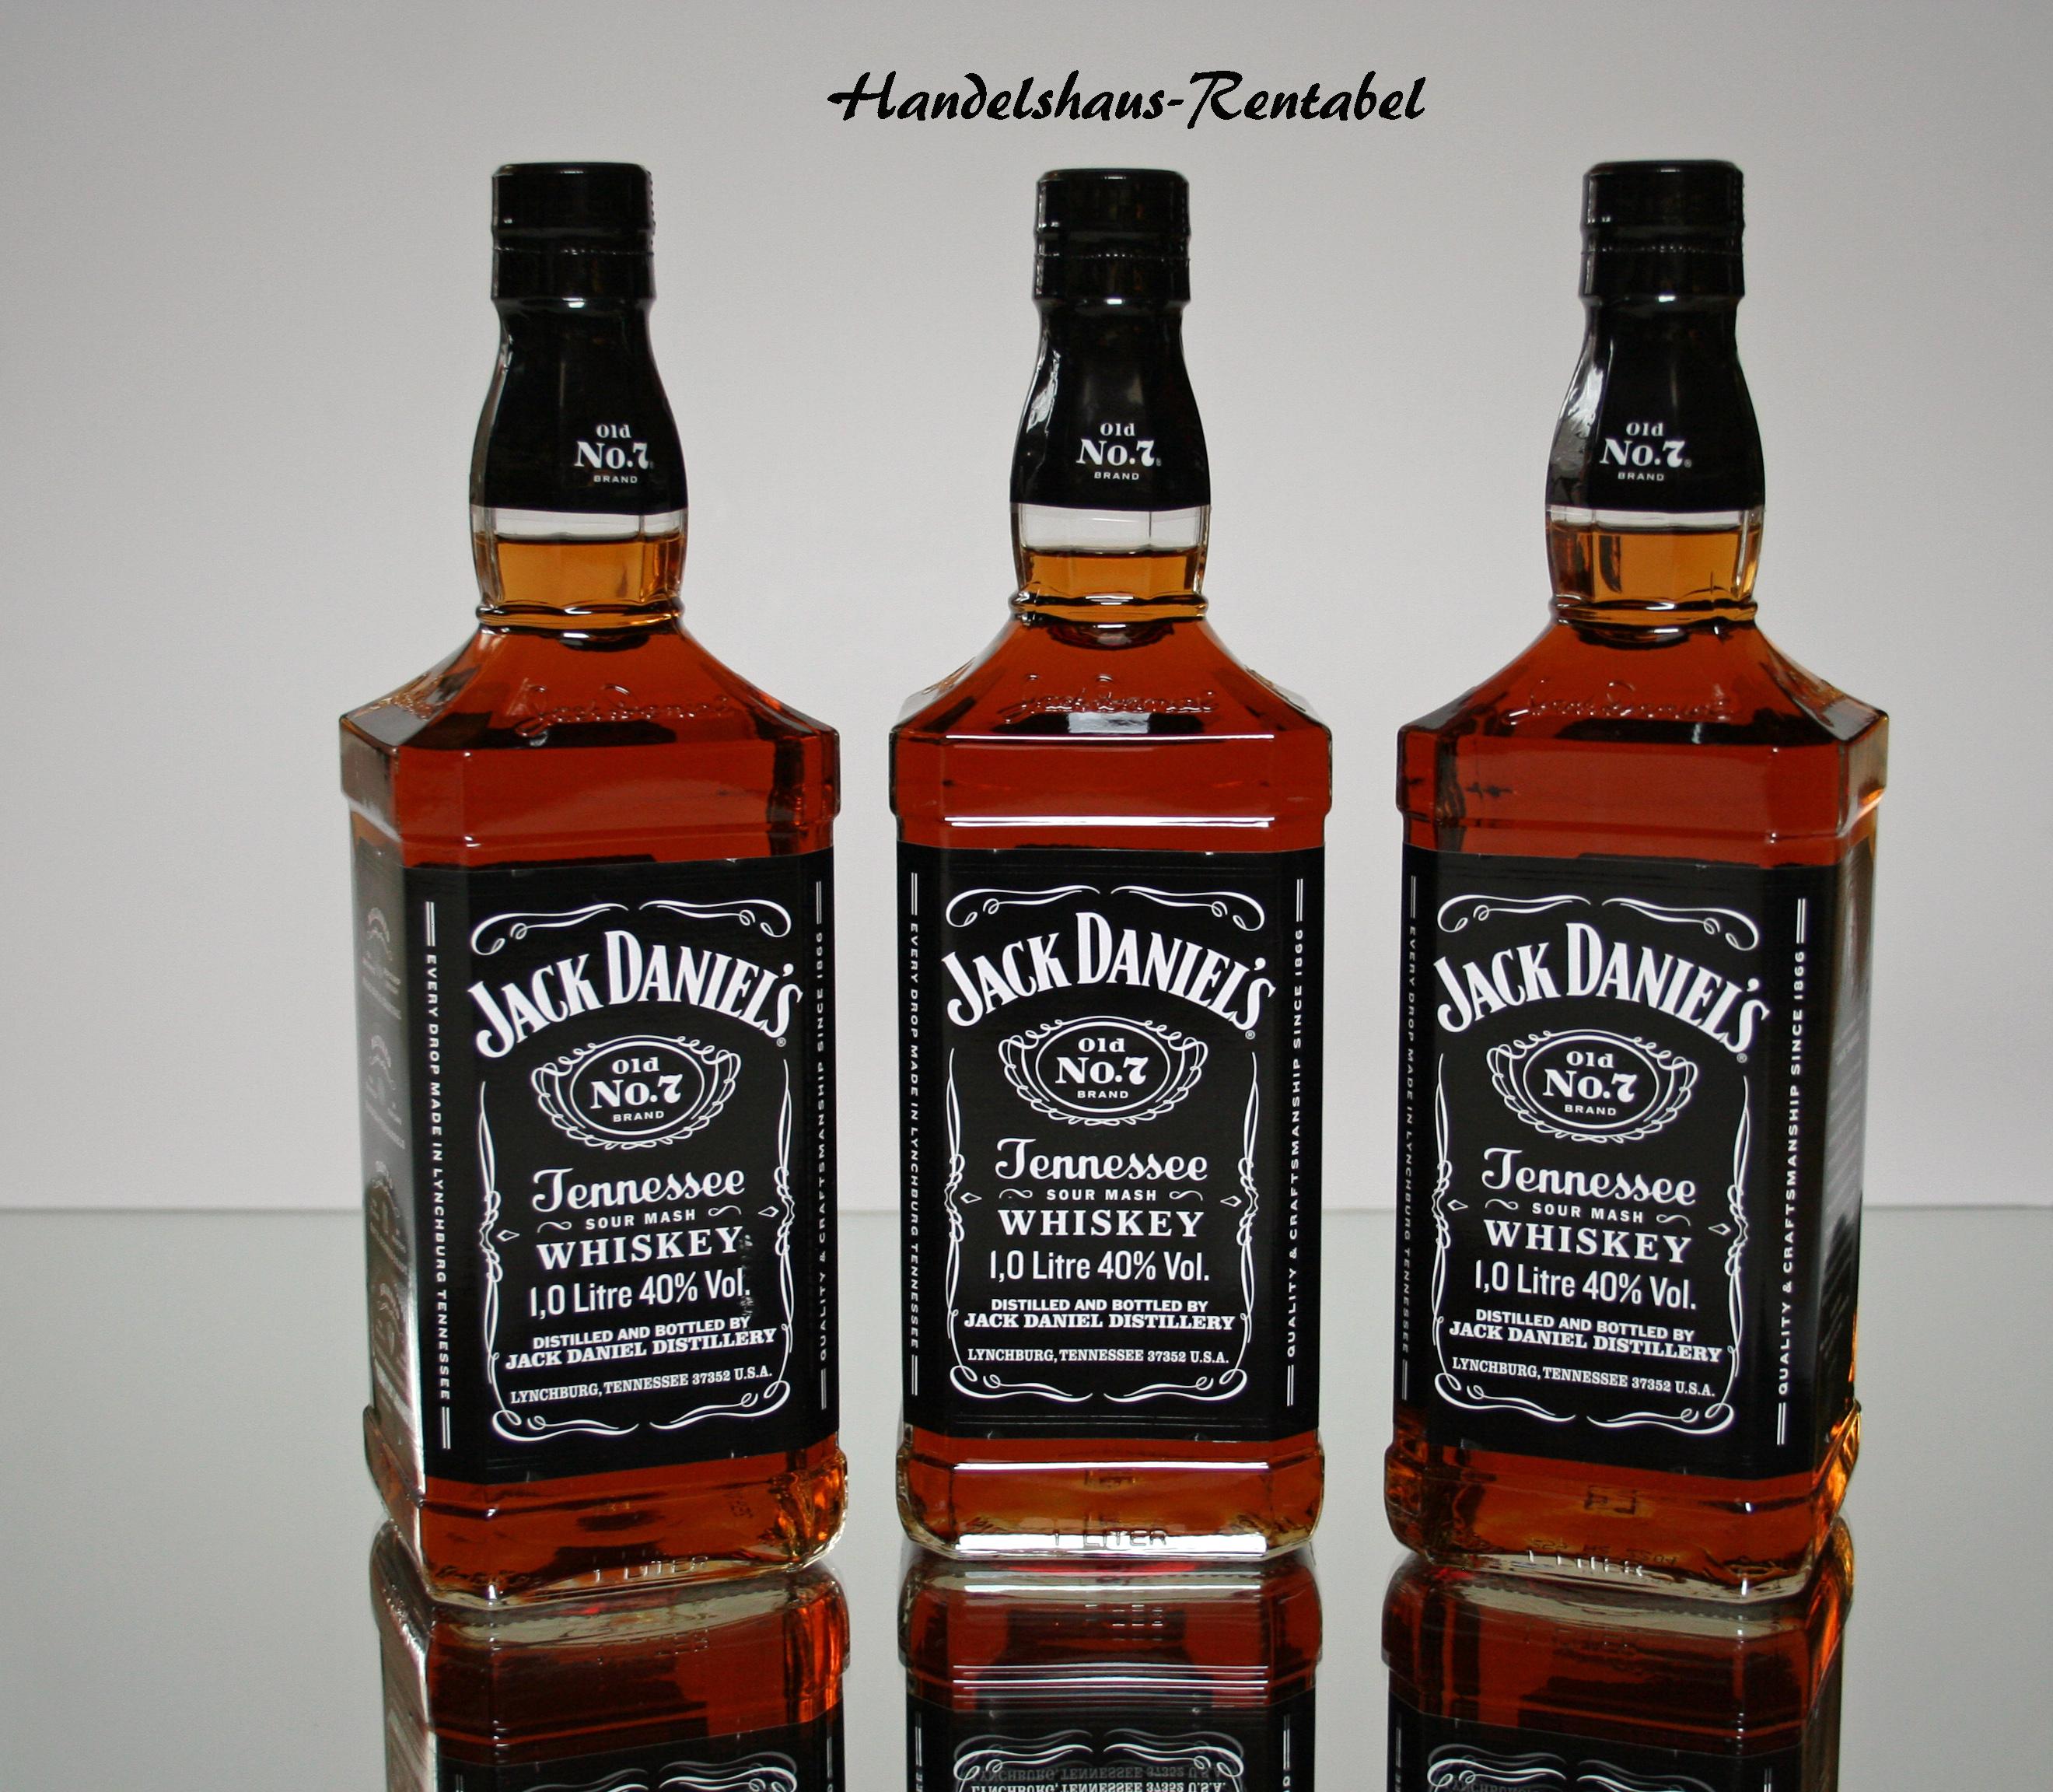 3 Flaschen Jack Daniels Tennessee Whiskey 40% 1,0 Ltr. ( 26,16 €/ L ...